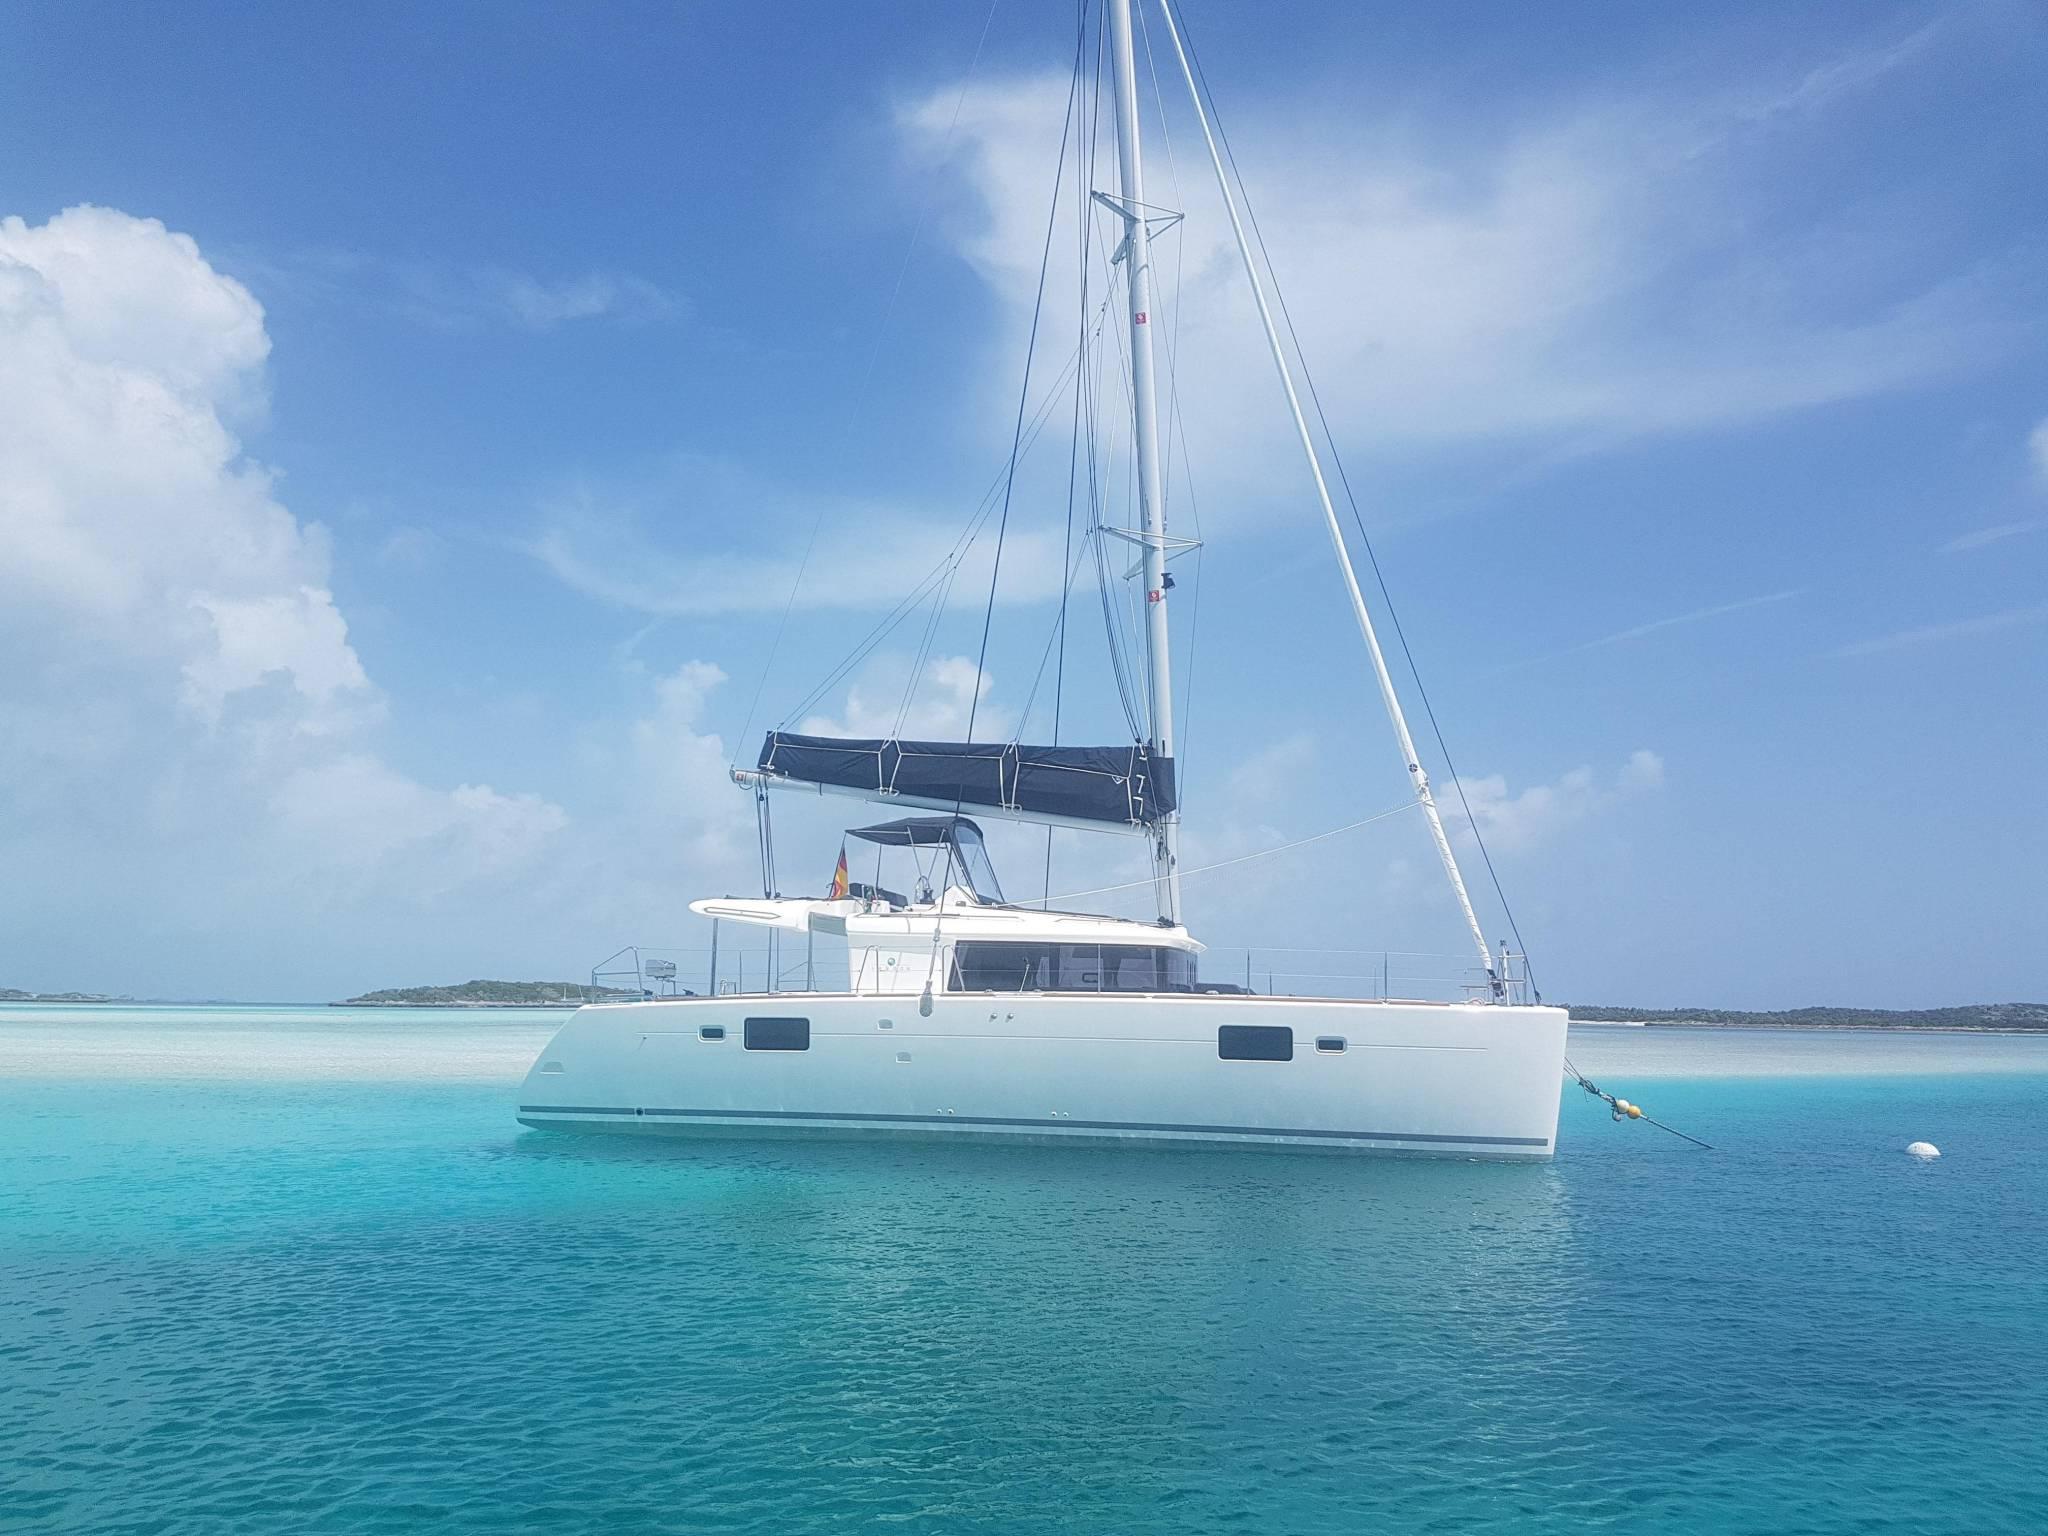 Lagoon 450 sailing in Mexico